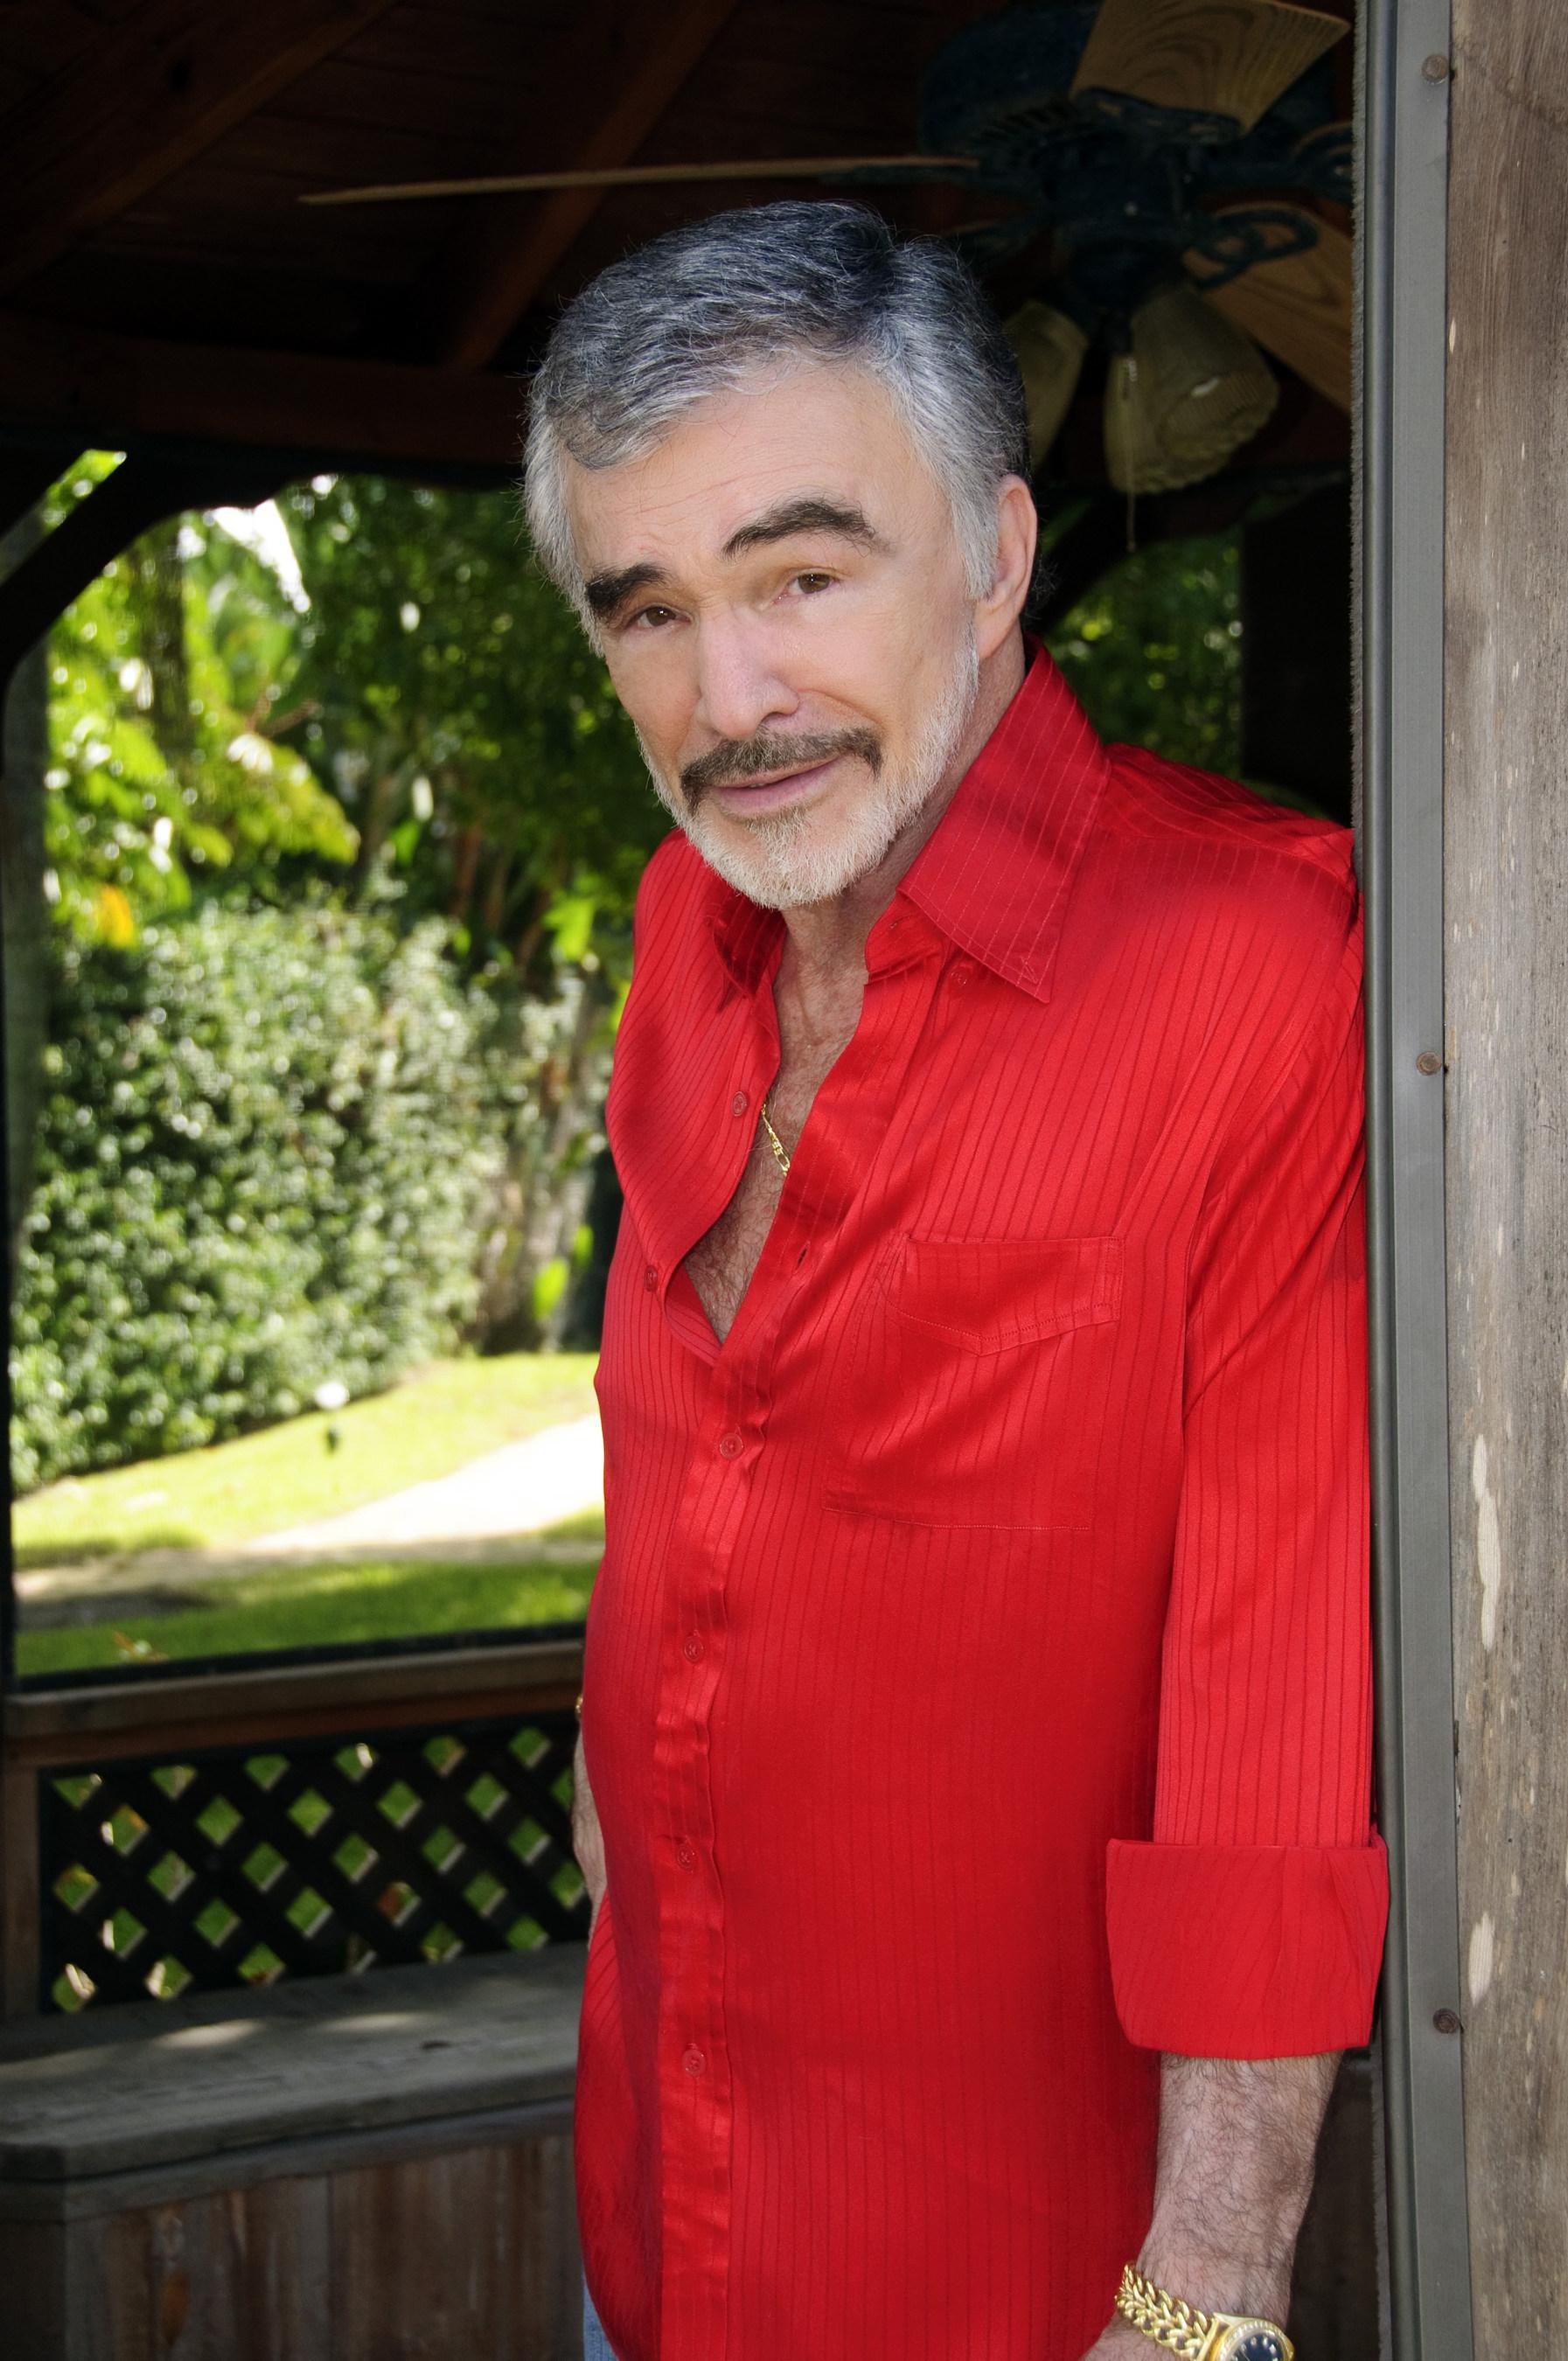 Burt Reynolds Gunsmoke Celebrities To Attend Gunsmoke